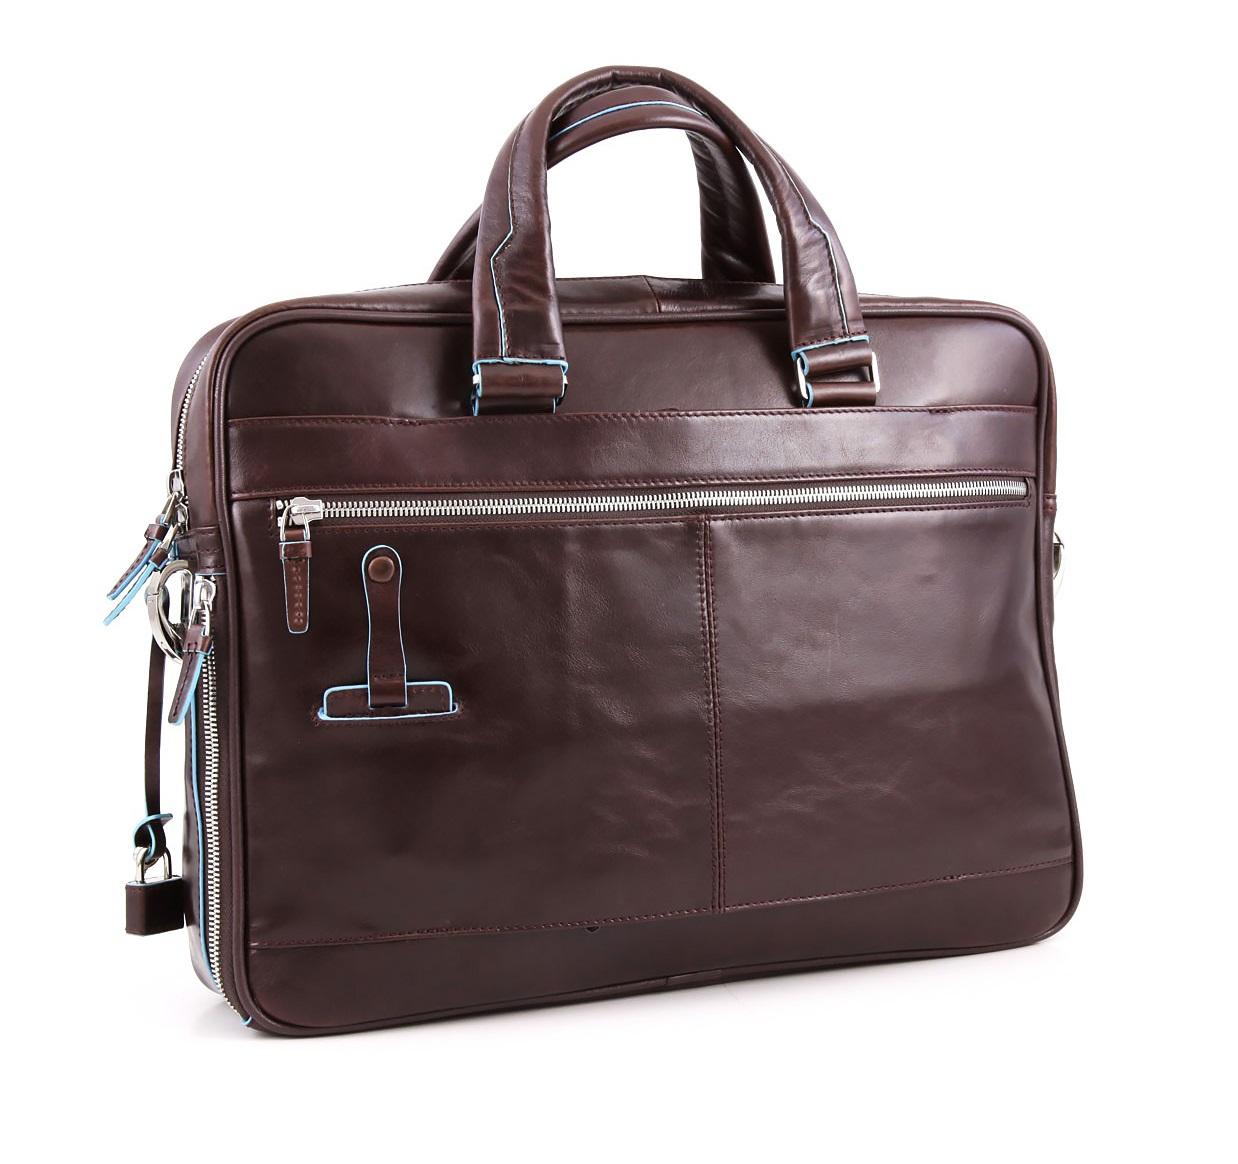 3b31630f0398 Сумка Piquadro Blue Square CA2849B2/MO Коричневая - Купить сумку ...